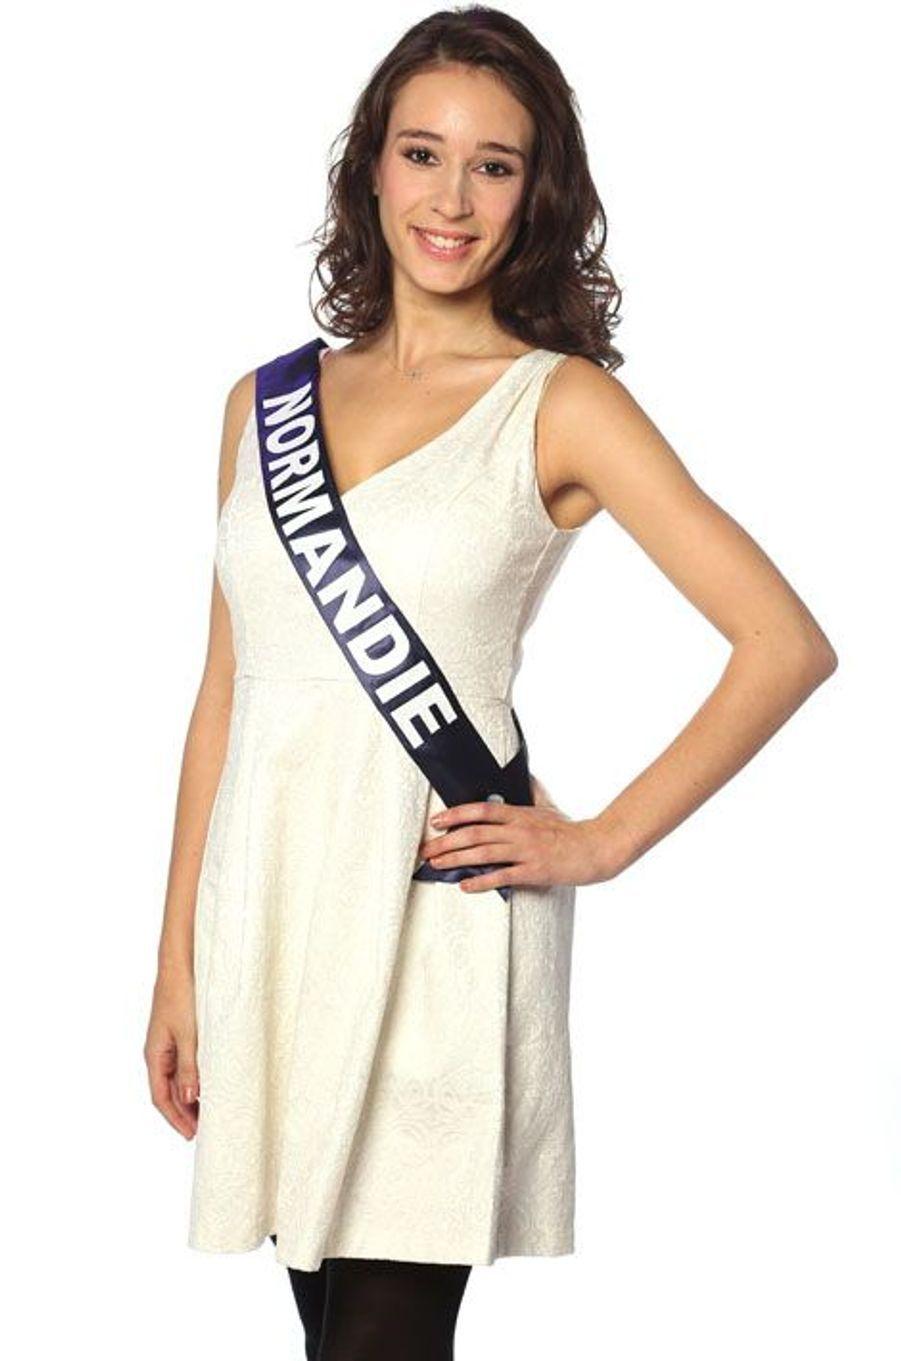 Ophélie Genest, 19 ans, Miss Normandie